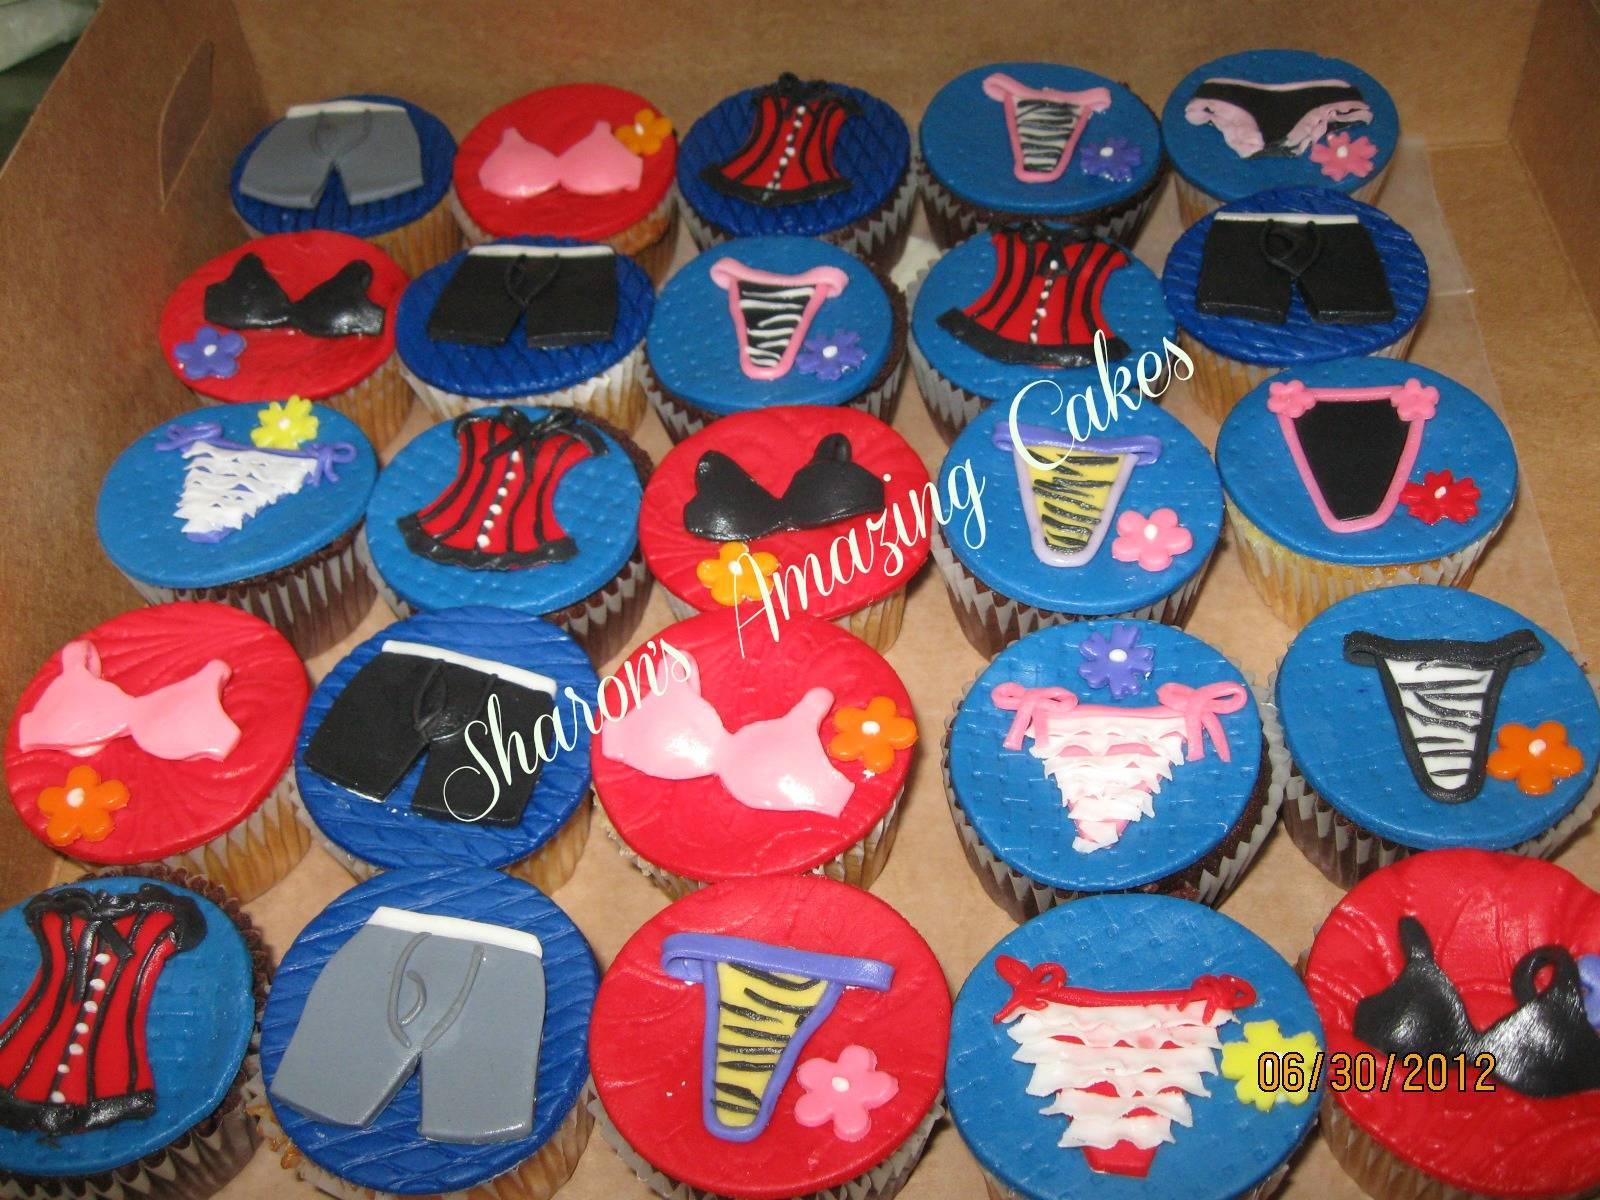 CC32 -Lingerie Cupcakes